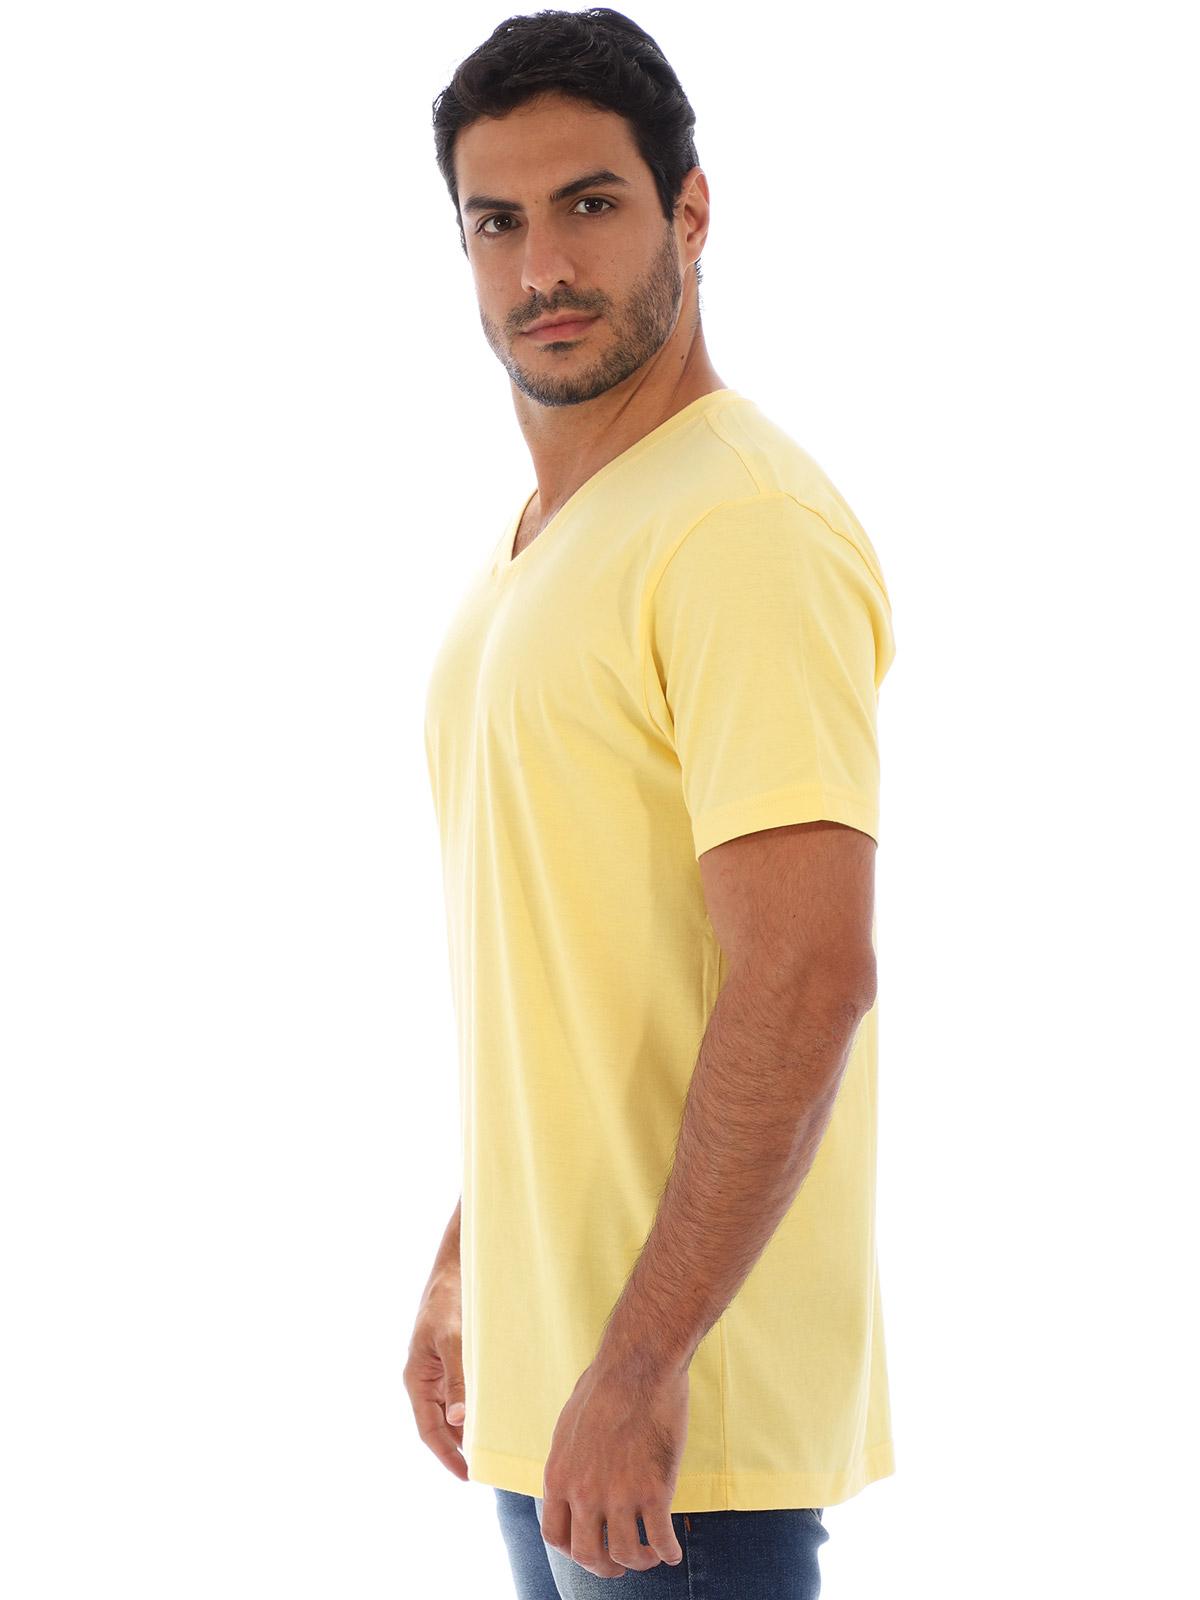 Camiseta Anistia Basica Decote V. Lisa Amarelo